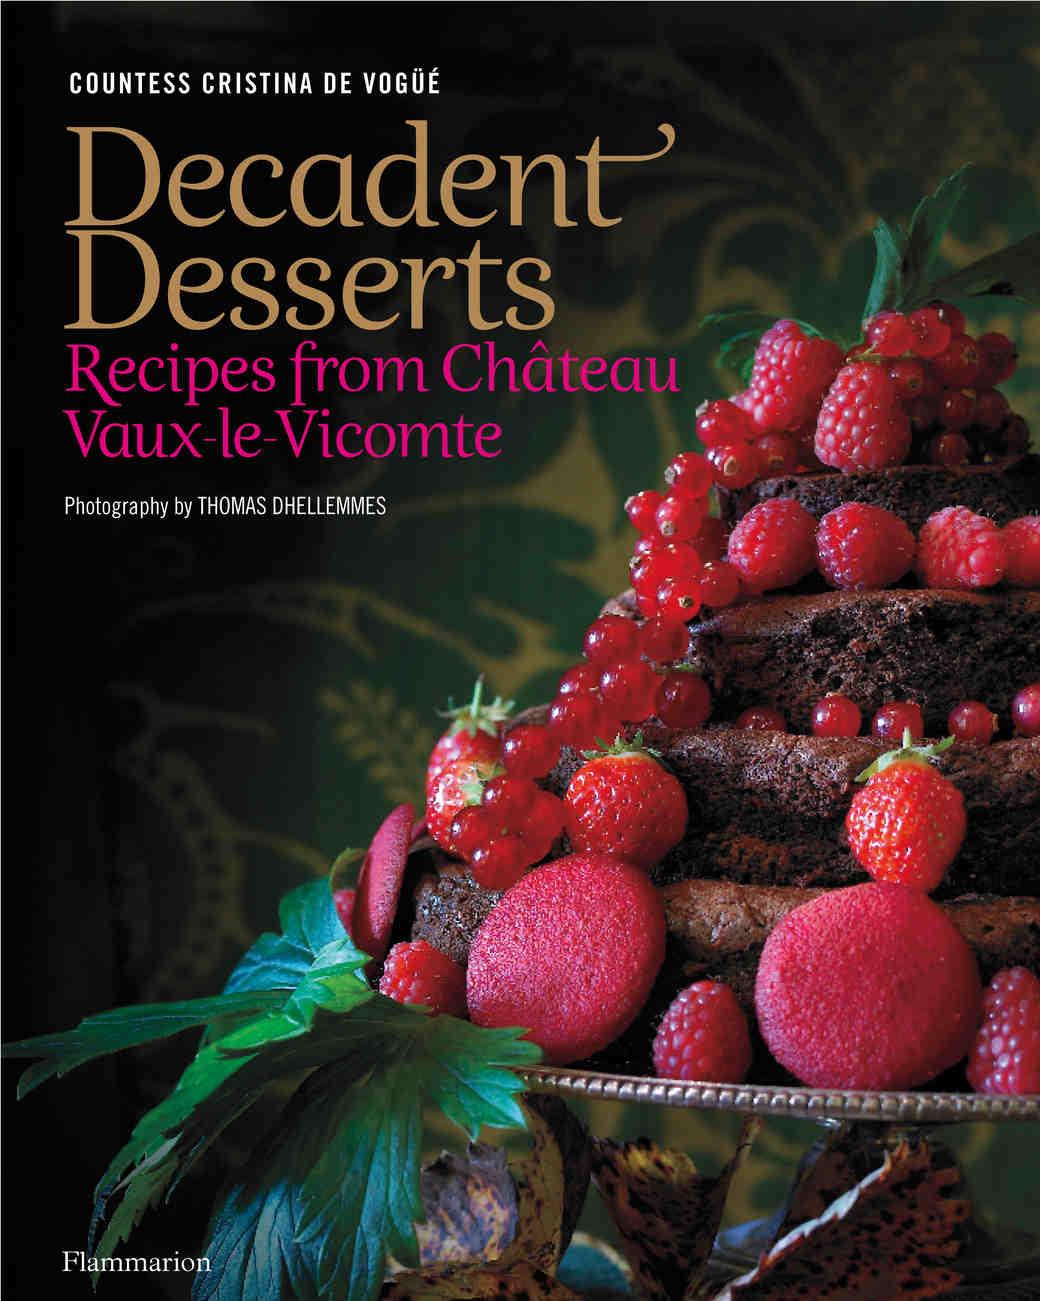 vaux-le-vicomte-decadent-desserts-book-0914.jpg